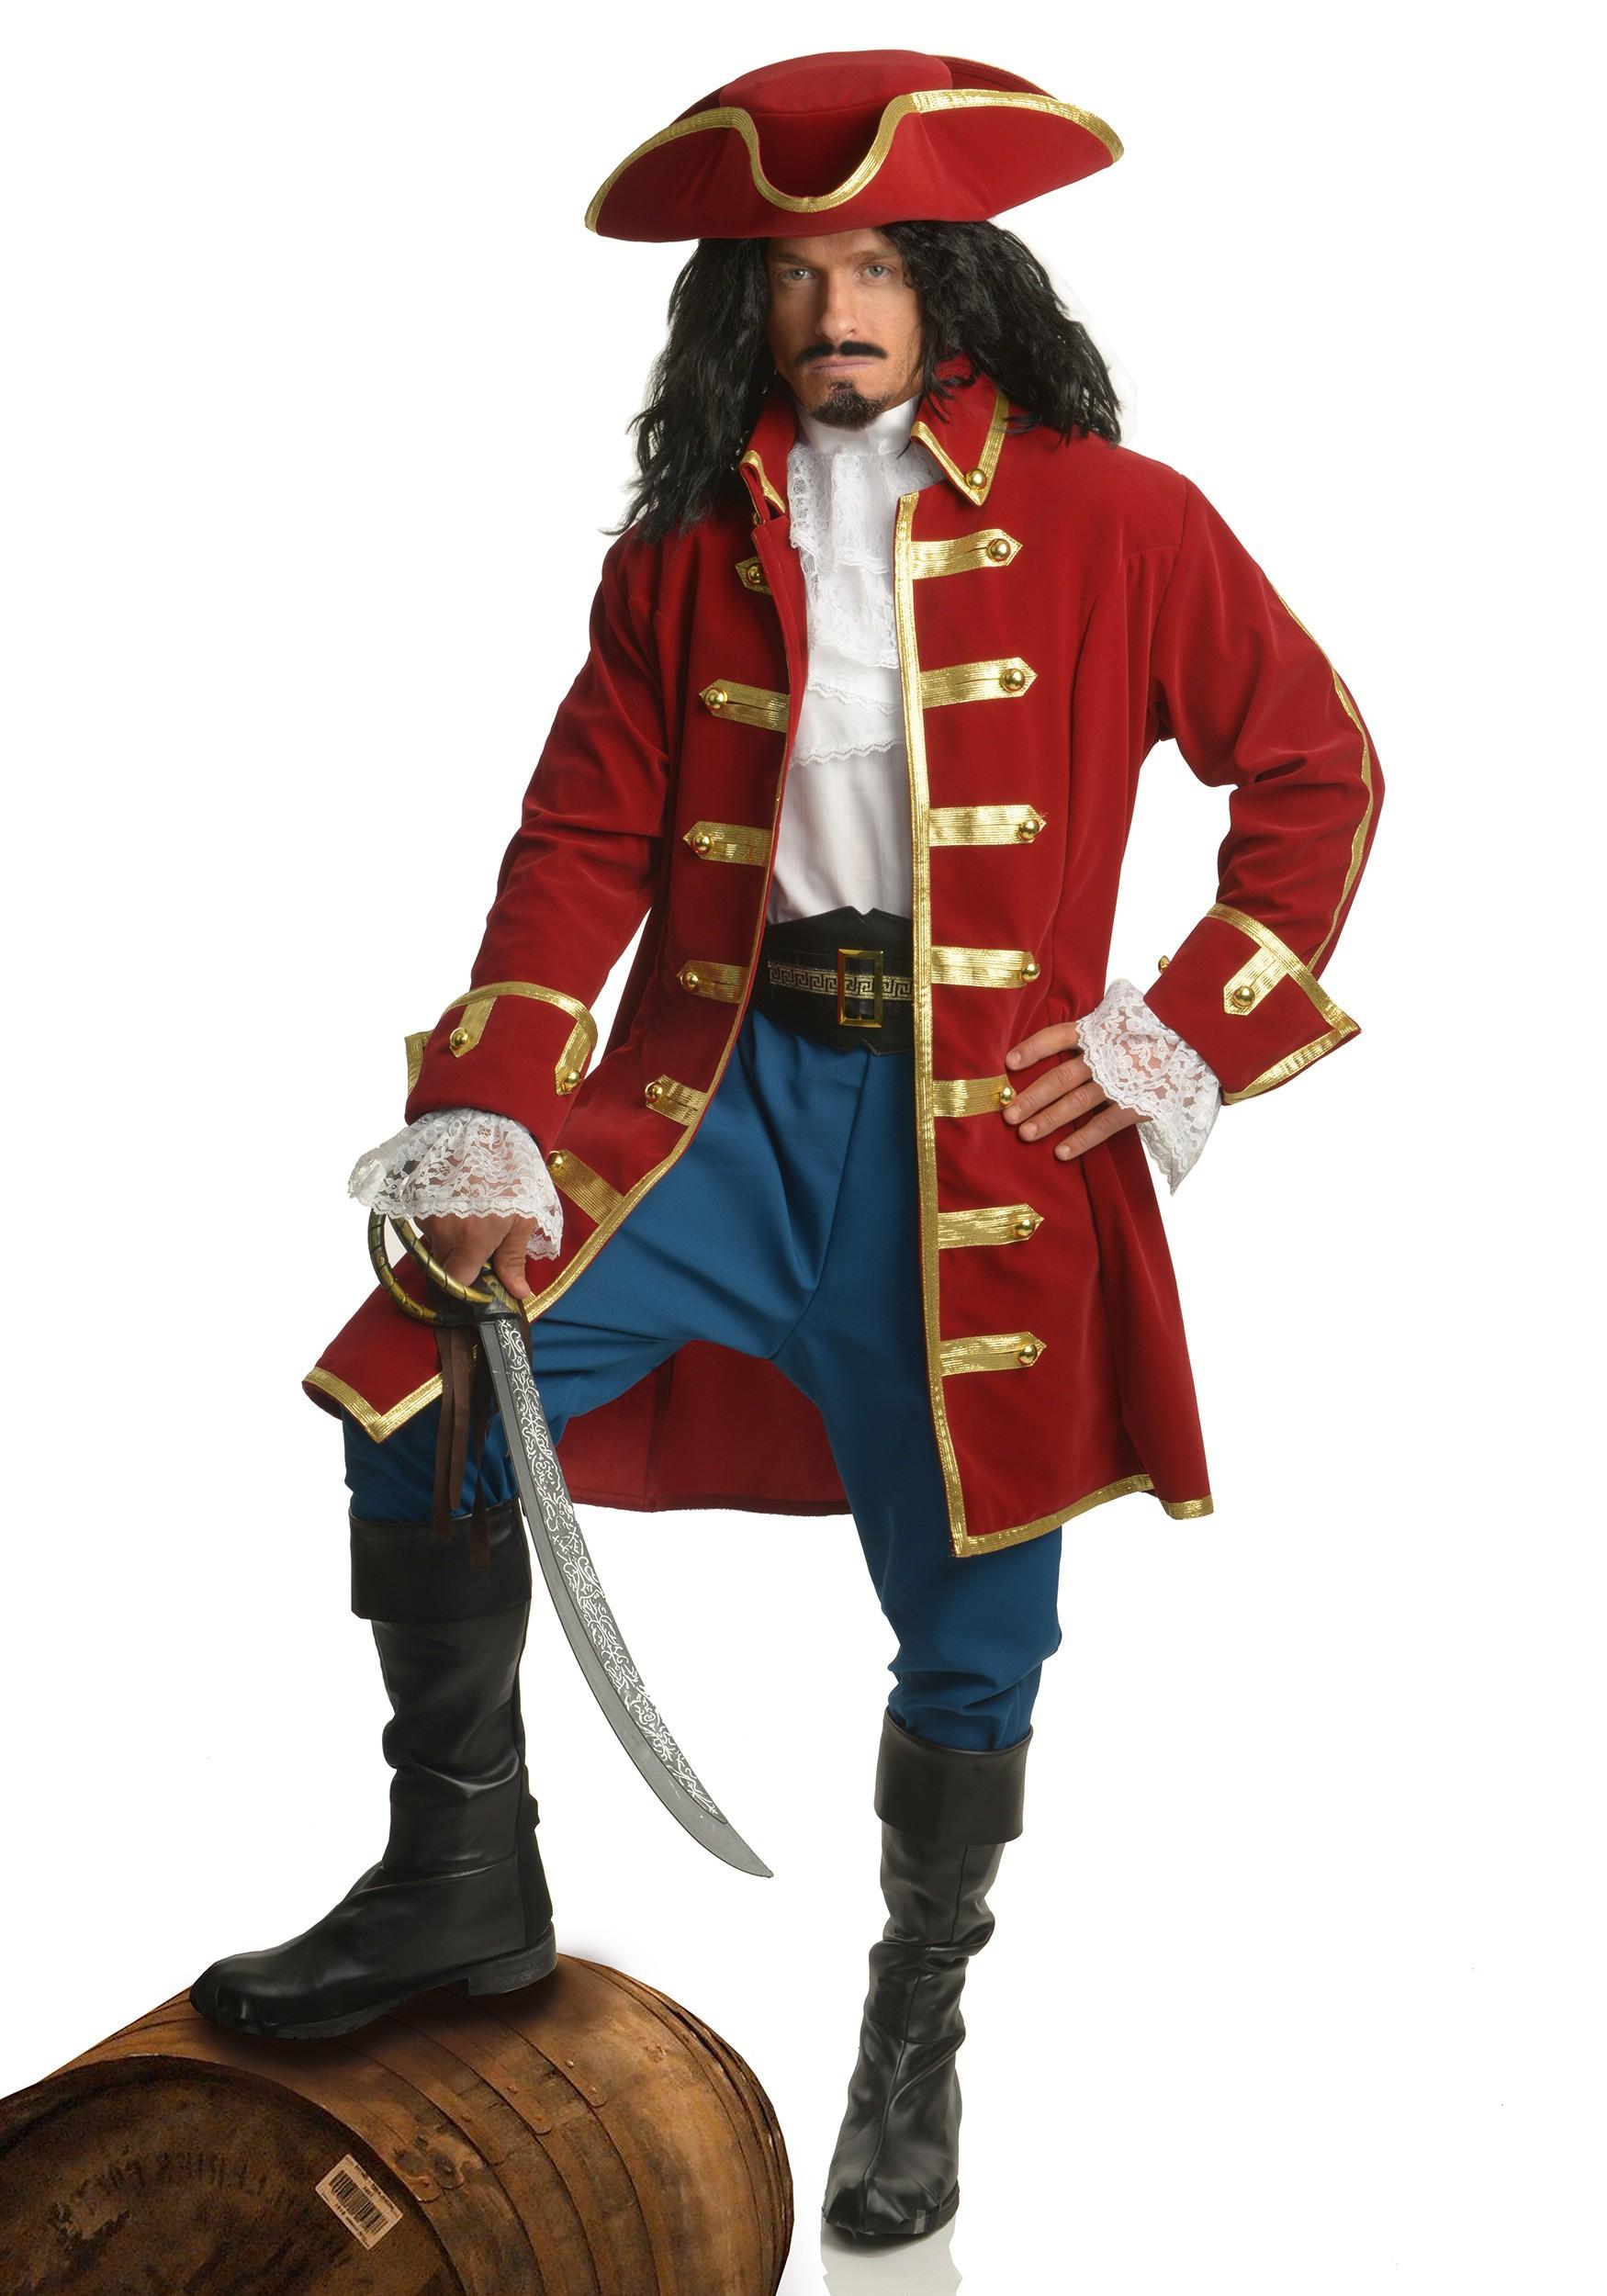 Amazing Captain Morgan Pictures & Backgrounds